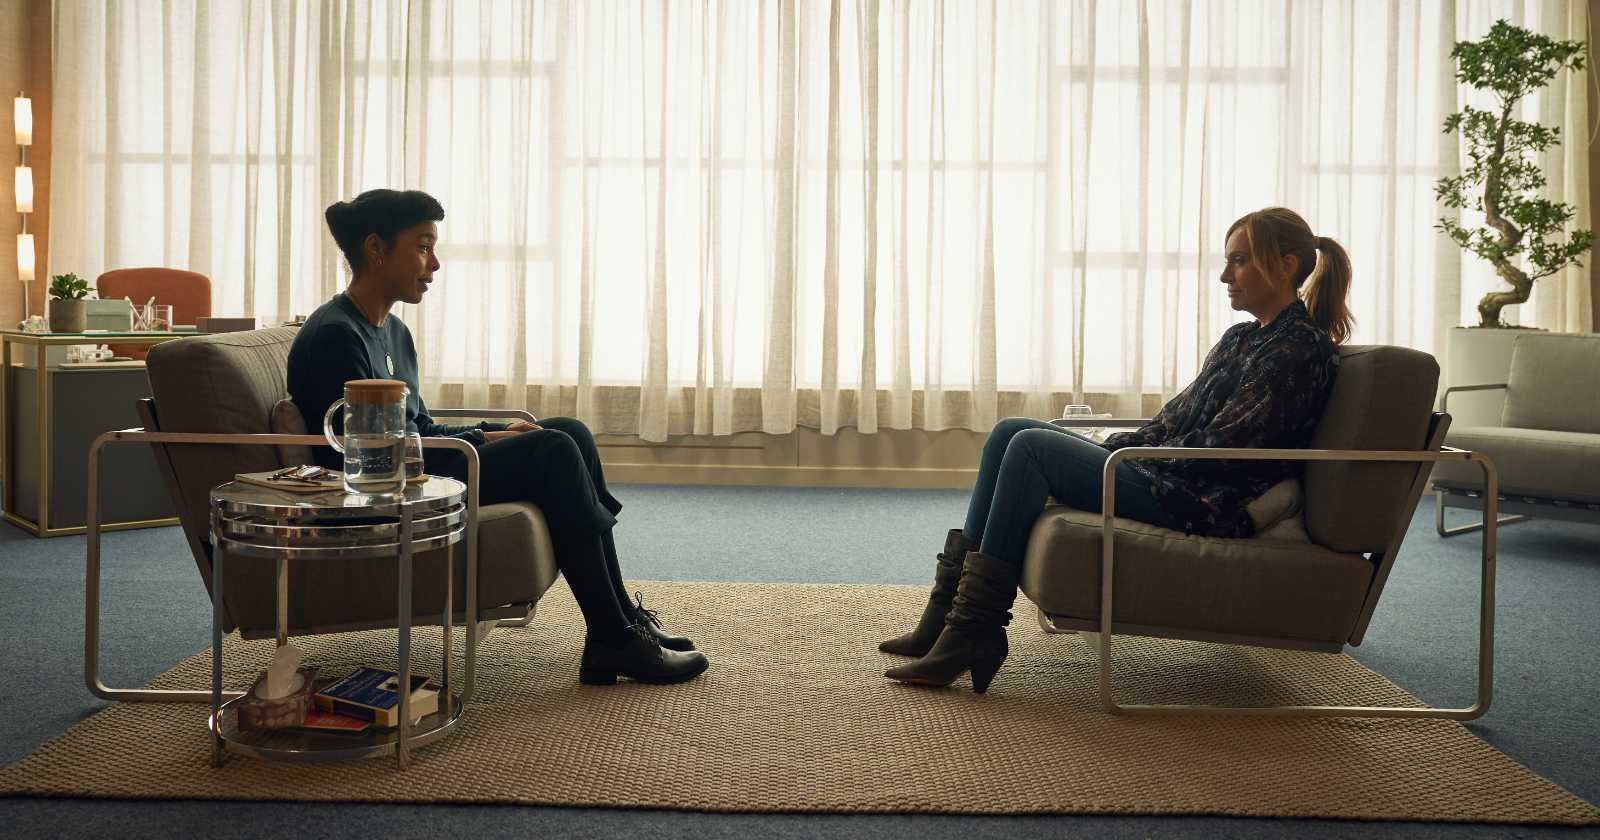 Joy (Toni Collette, a la derecha) conversando con su psicóloga Angela (Sophie Okonedo, a la izquierda). En Wanderlust, serie original de Netflix.